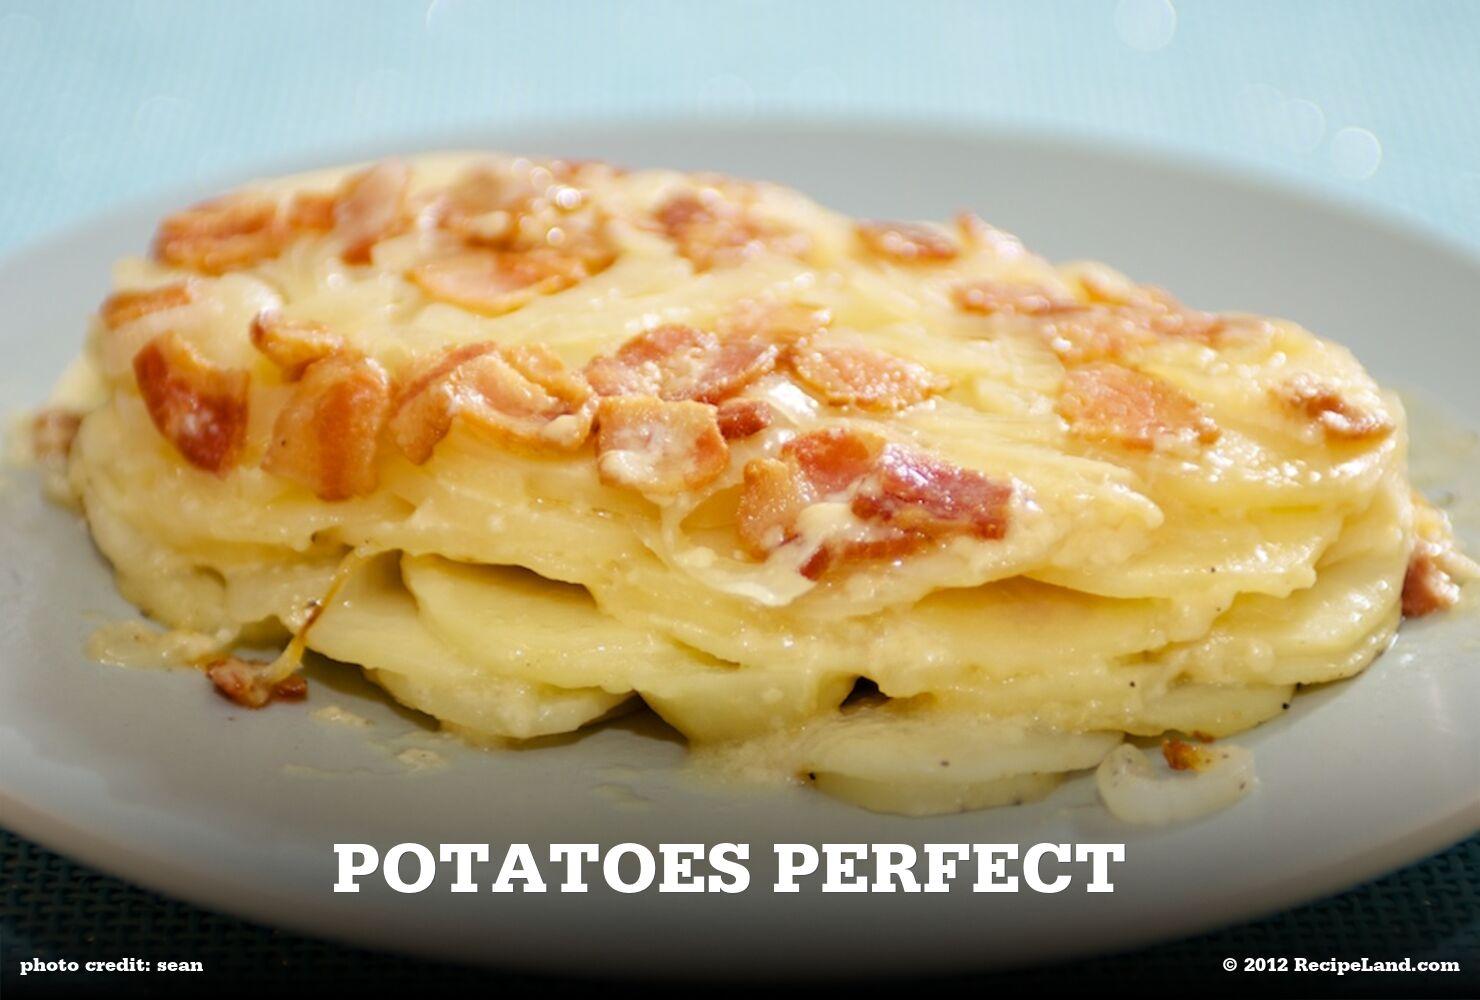 Potatoes Perfect